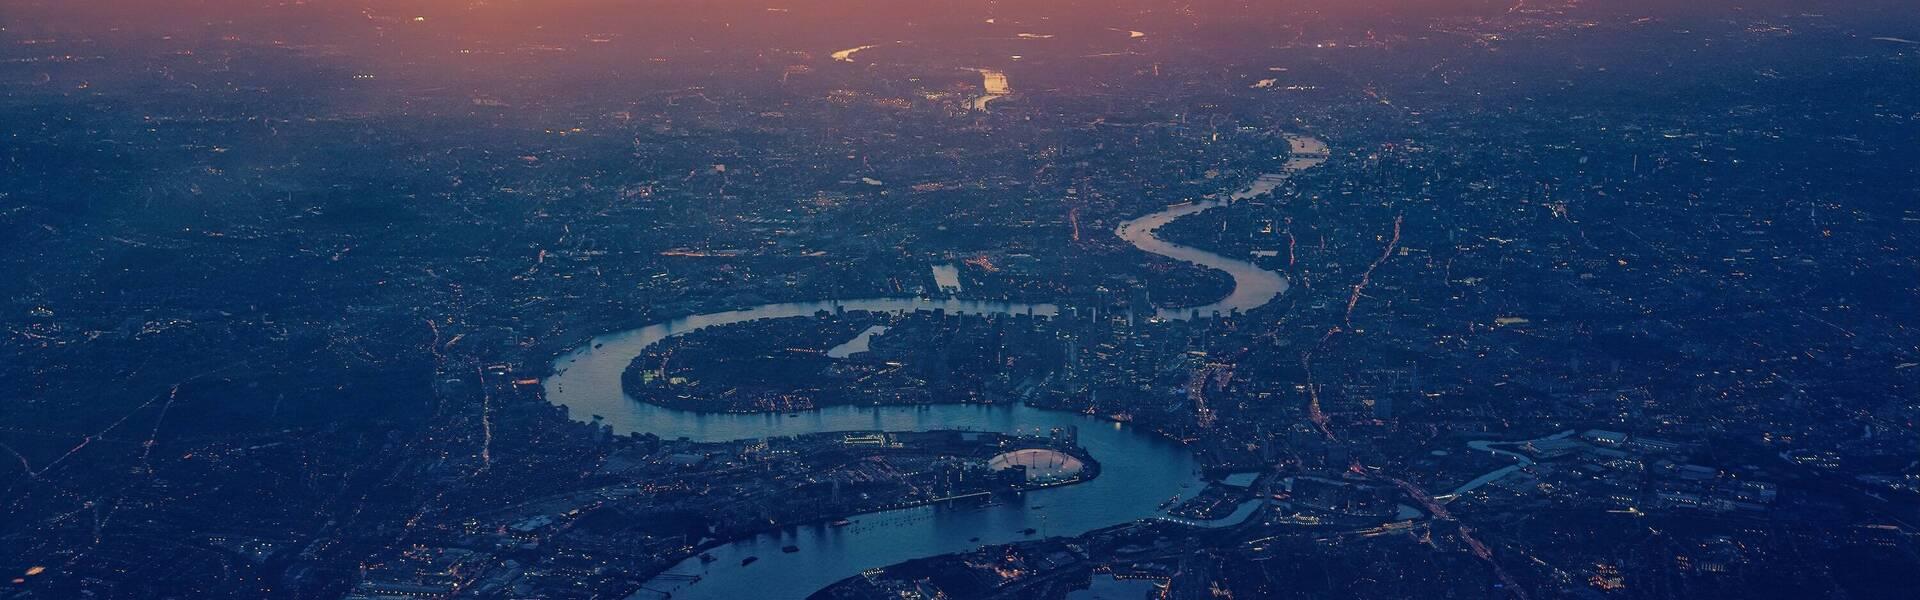 https://d337pdvlg6sju5.cloudfront.net/media/images/properties/united-kingdom/london/strand-palace/offers/pexels-johannes-plenio-1637907_501_1920x600.jpg